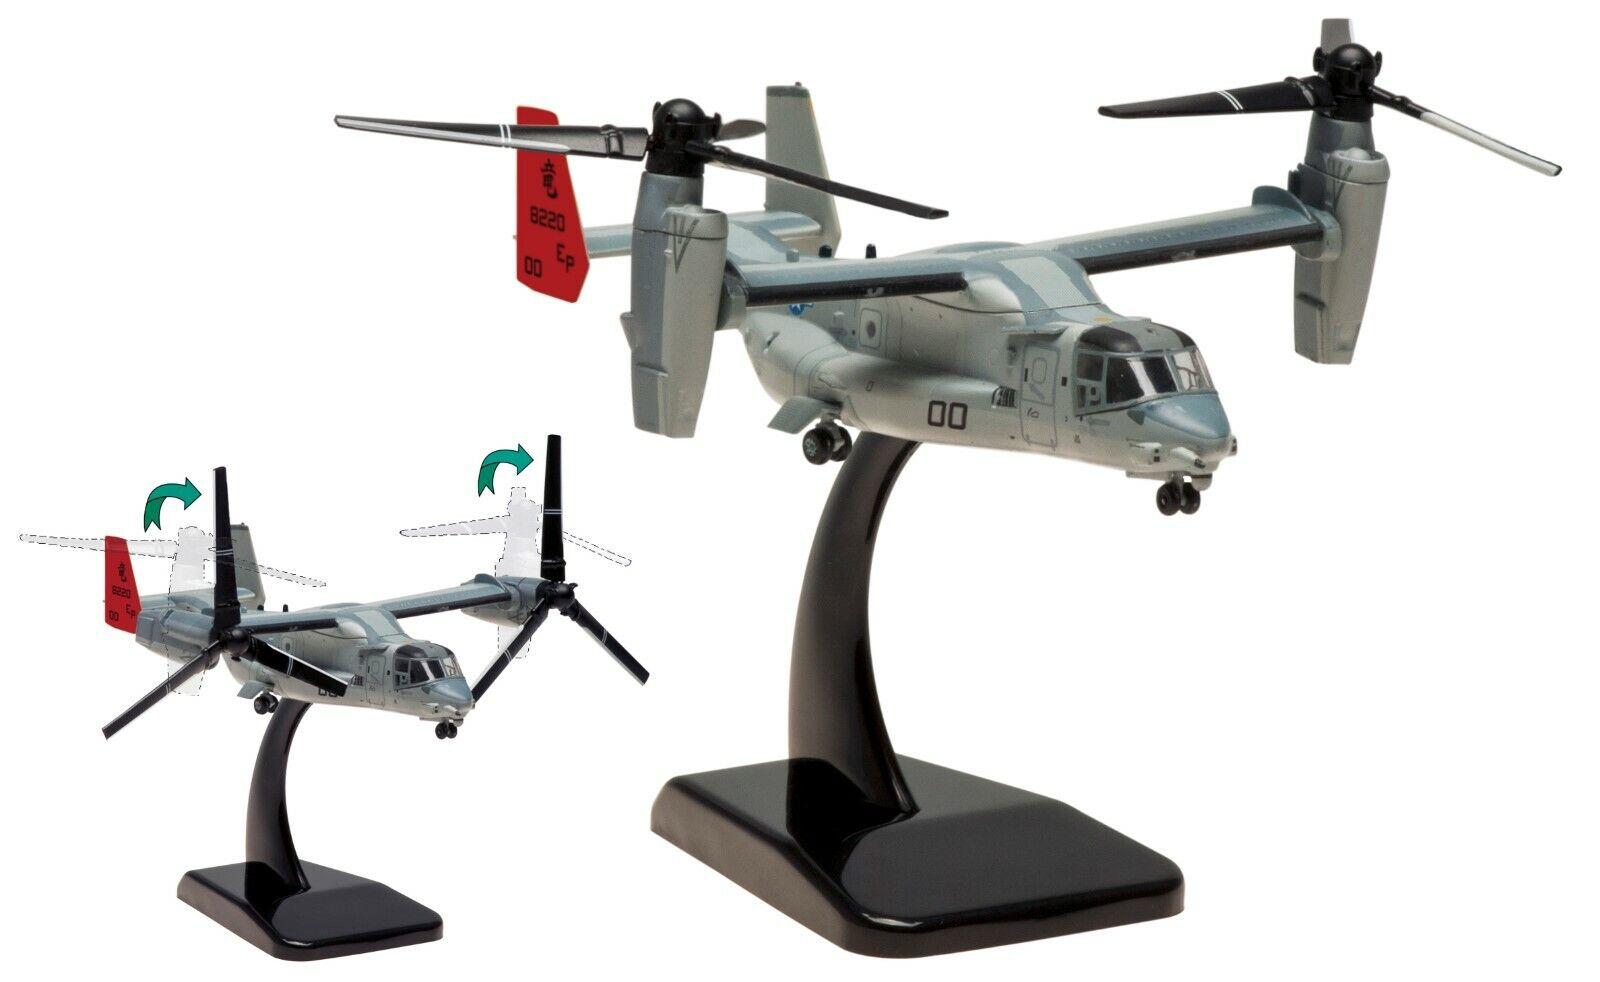 Hogan 1 200 mv-22b Osprey, kipprojoor-avión, US Marines, stand modelo, embalaje original, nuevo